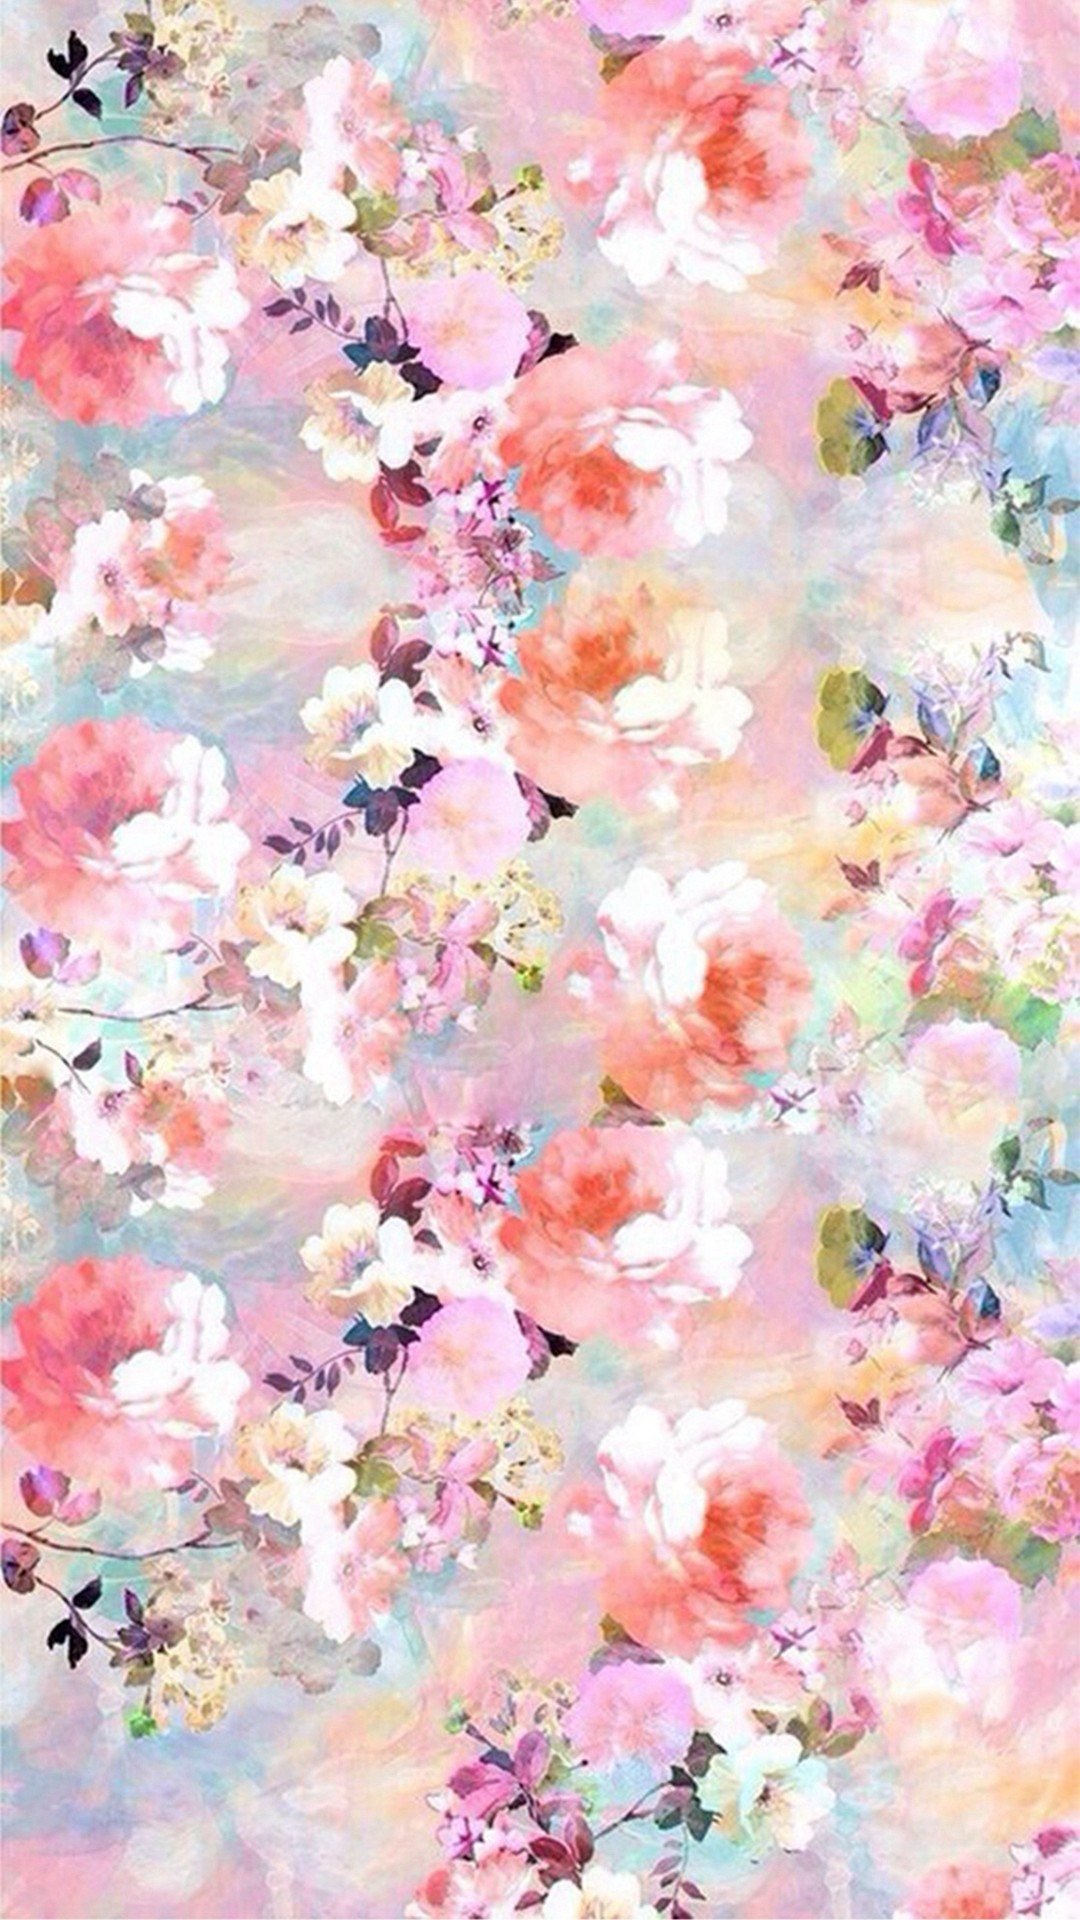 Watercolor Flowers Painting iPhone 8 wallpaper